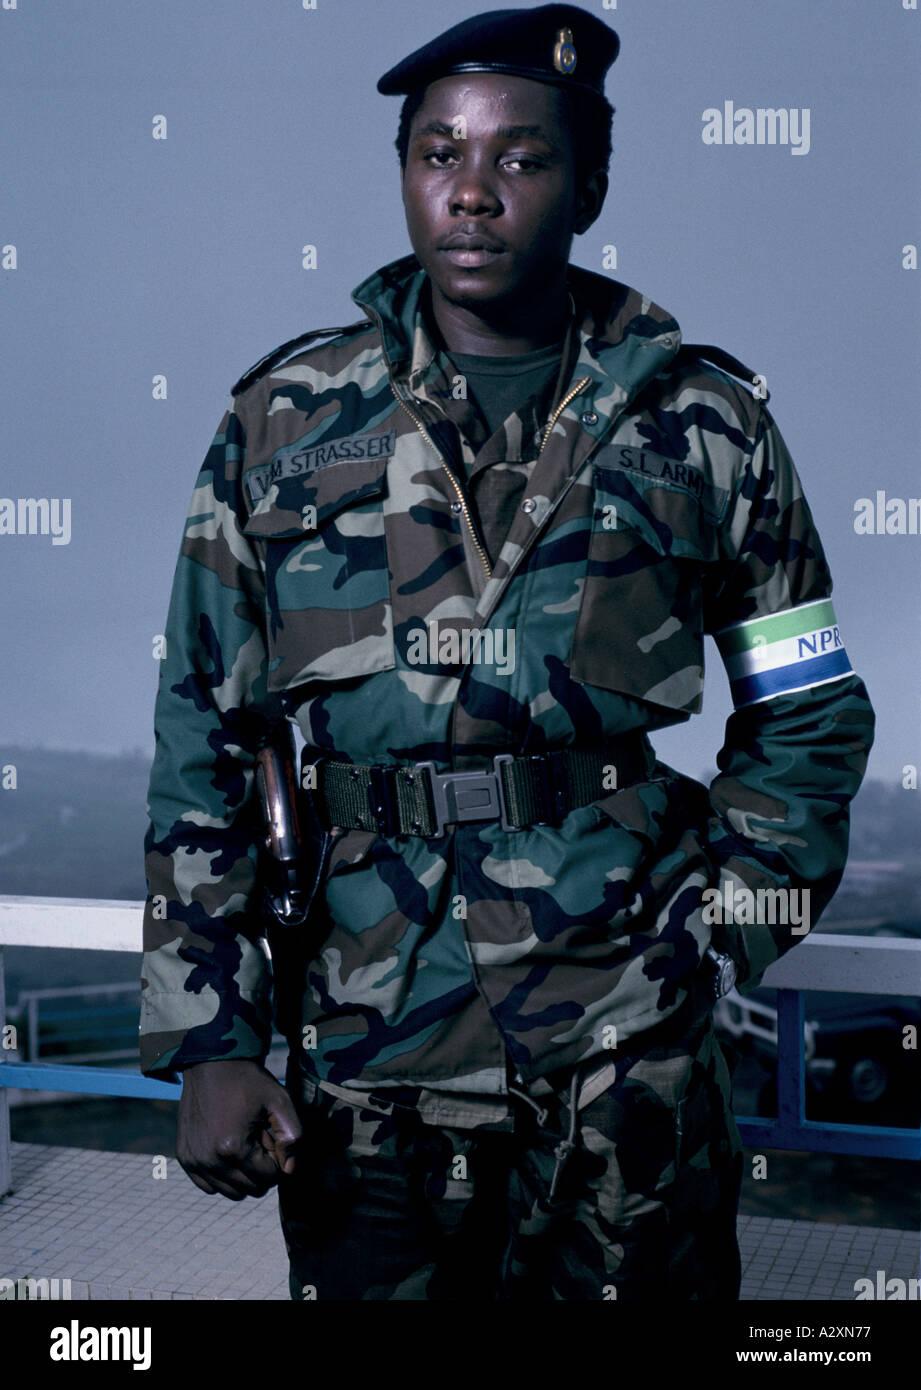 Captain Valentine Strasser 27 Leader Of The Provisional Ruling